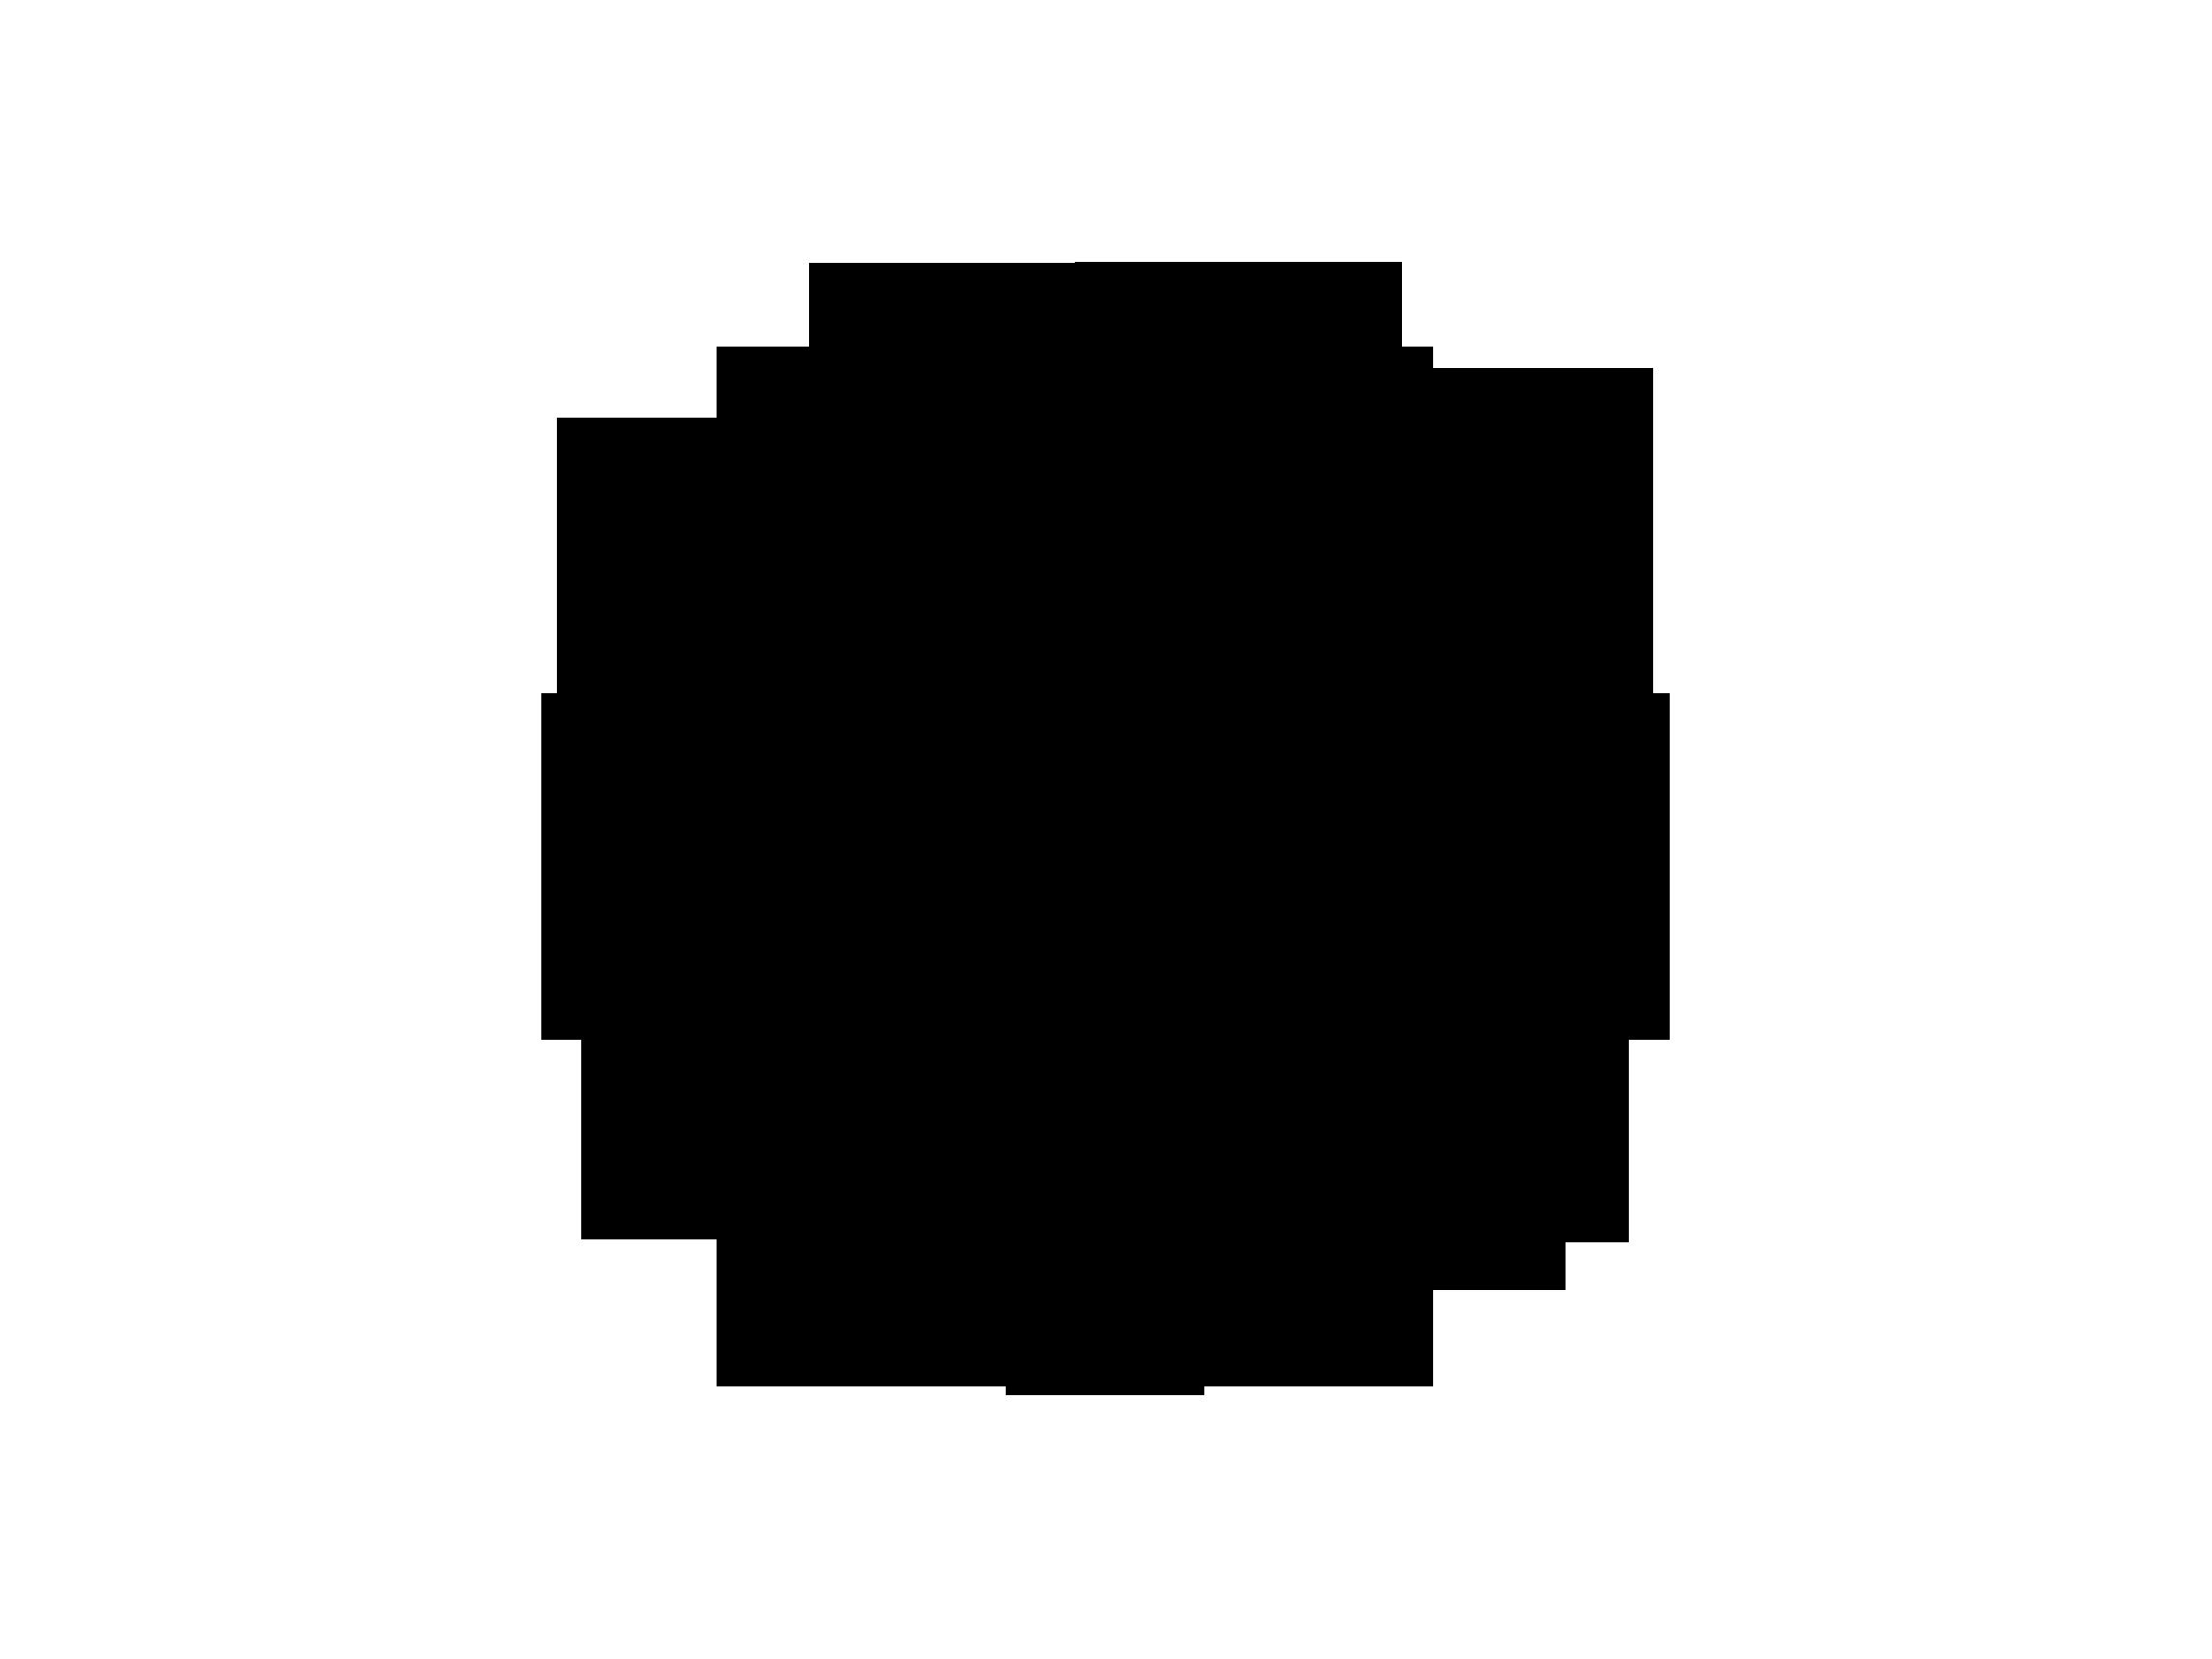 abc logo 1962 by Paul Rand - Abc Logo PNG